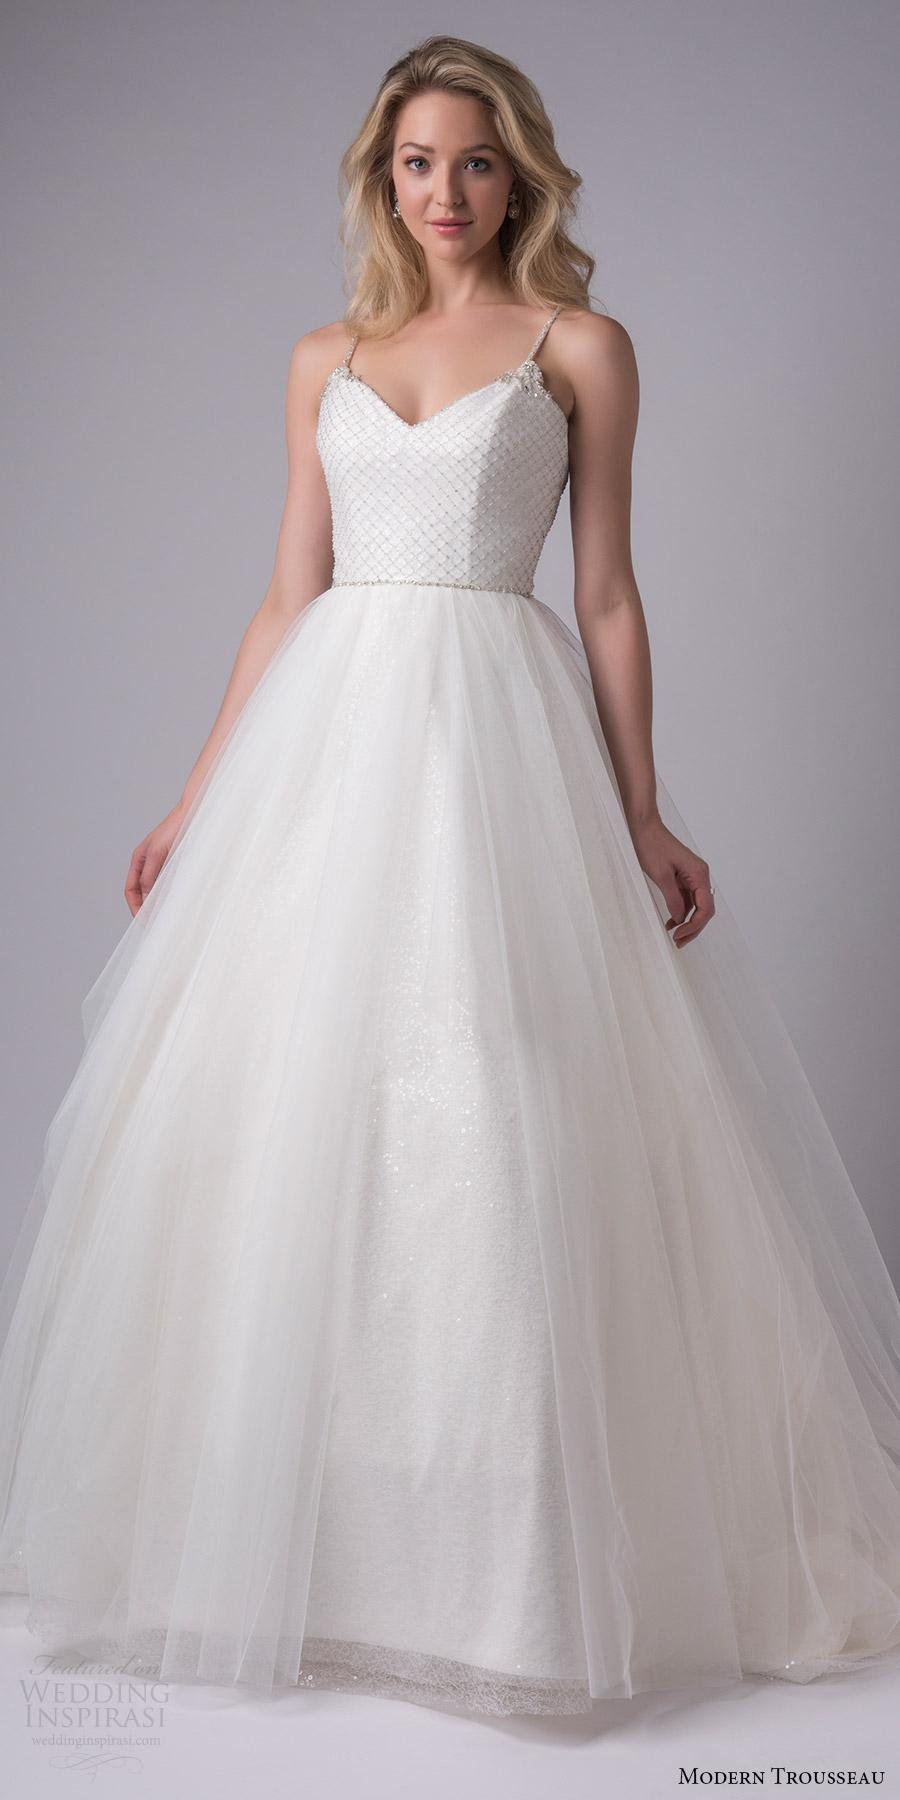 modern trousseau bridal fall 2017 sleeveless vneck beaded bodice spaghetti straps ball gown wedding dress (astrid) mv